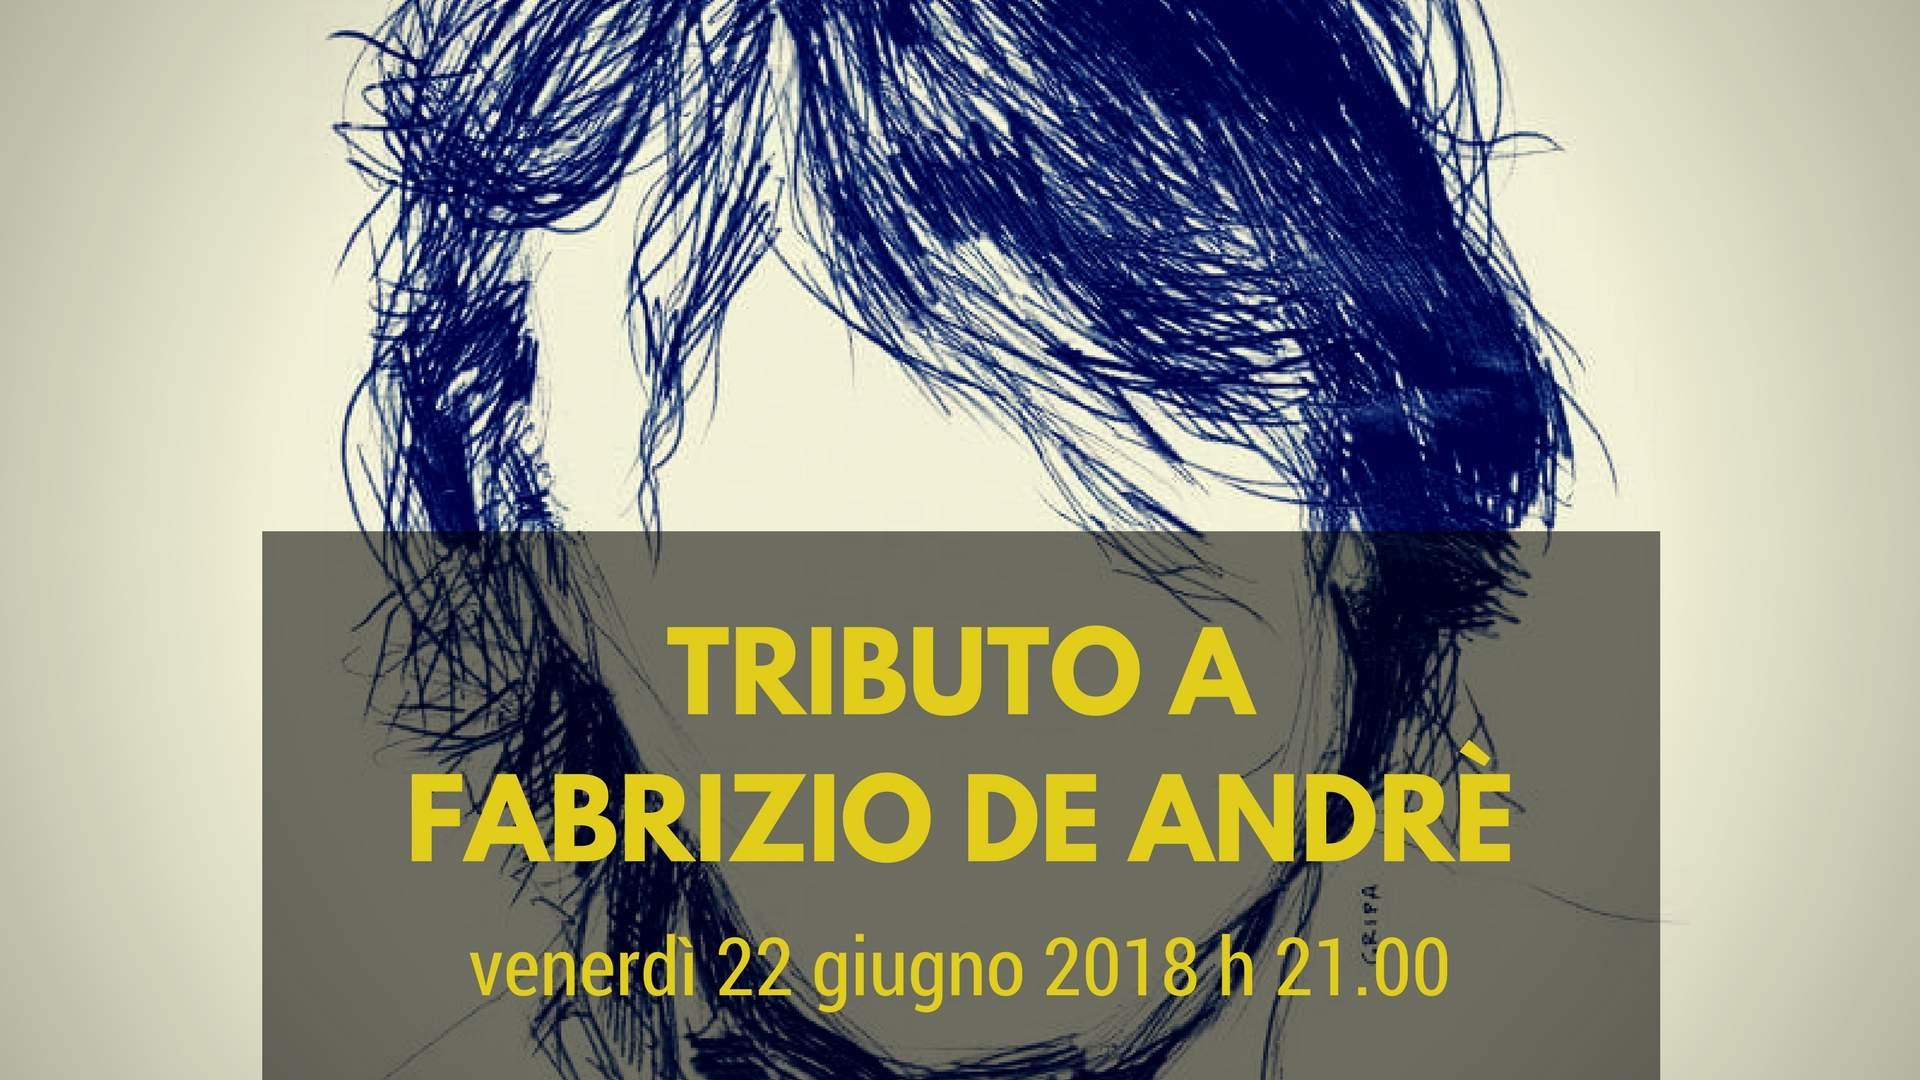 22 giugno 2018 Tributo a De Andrè a Palazzo Pesce